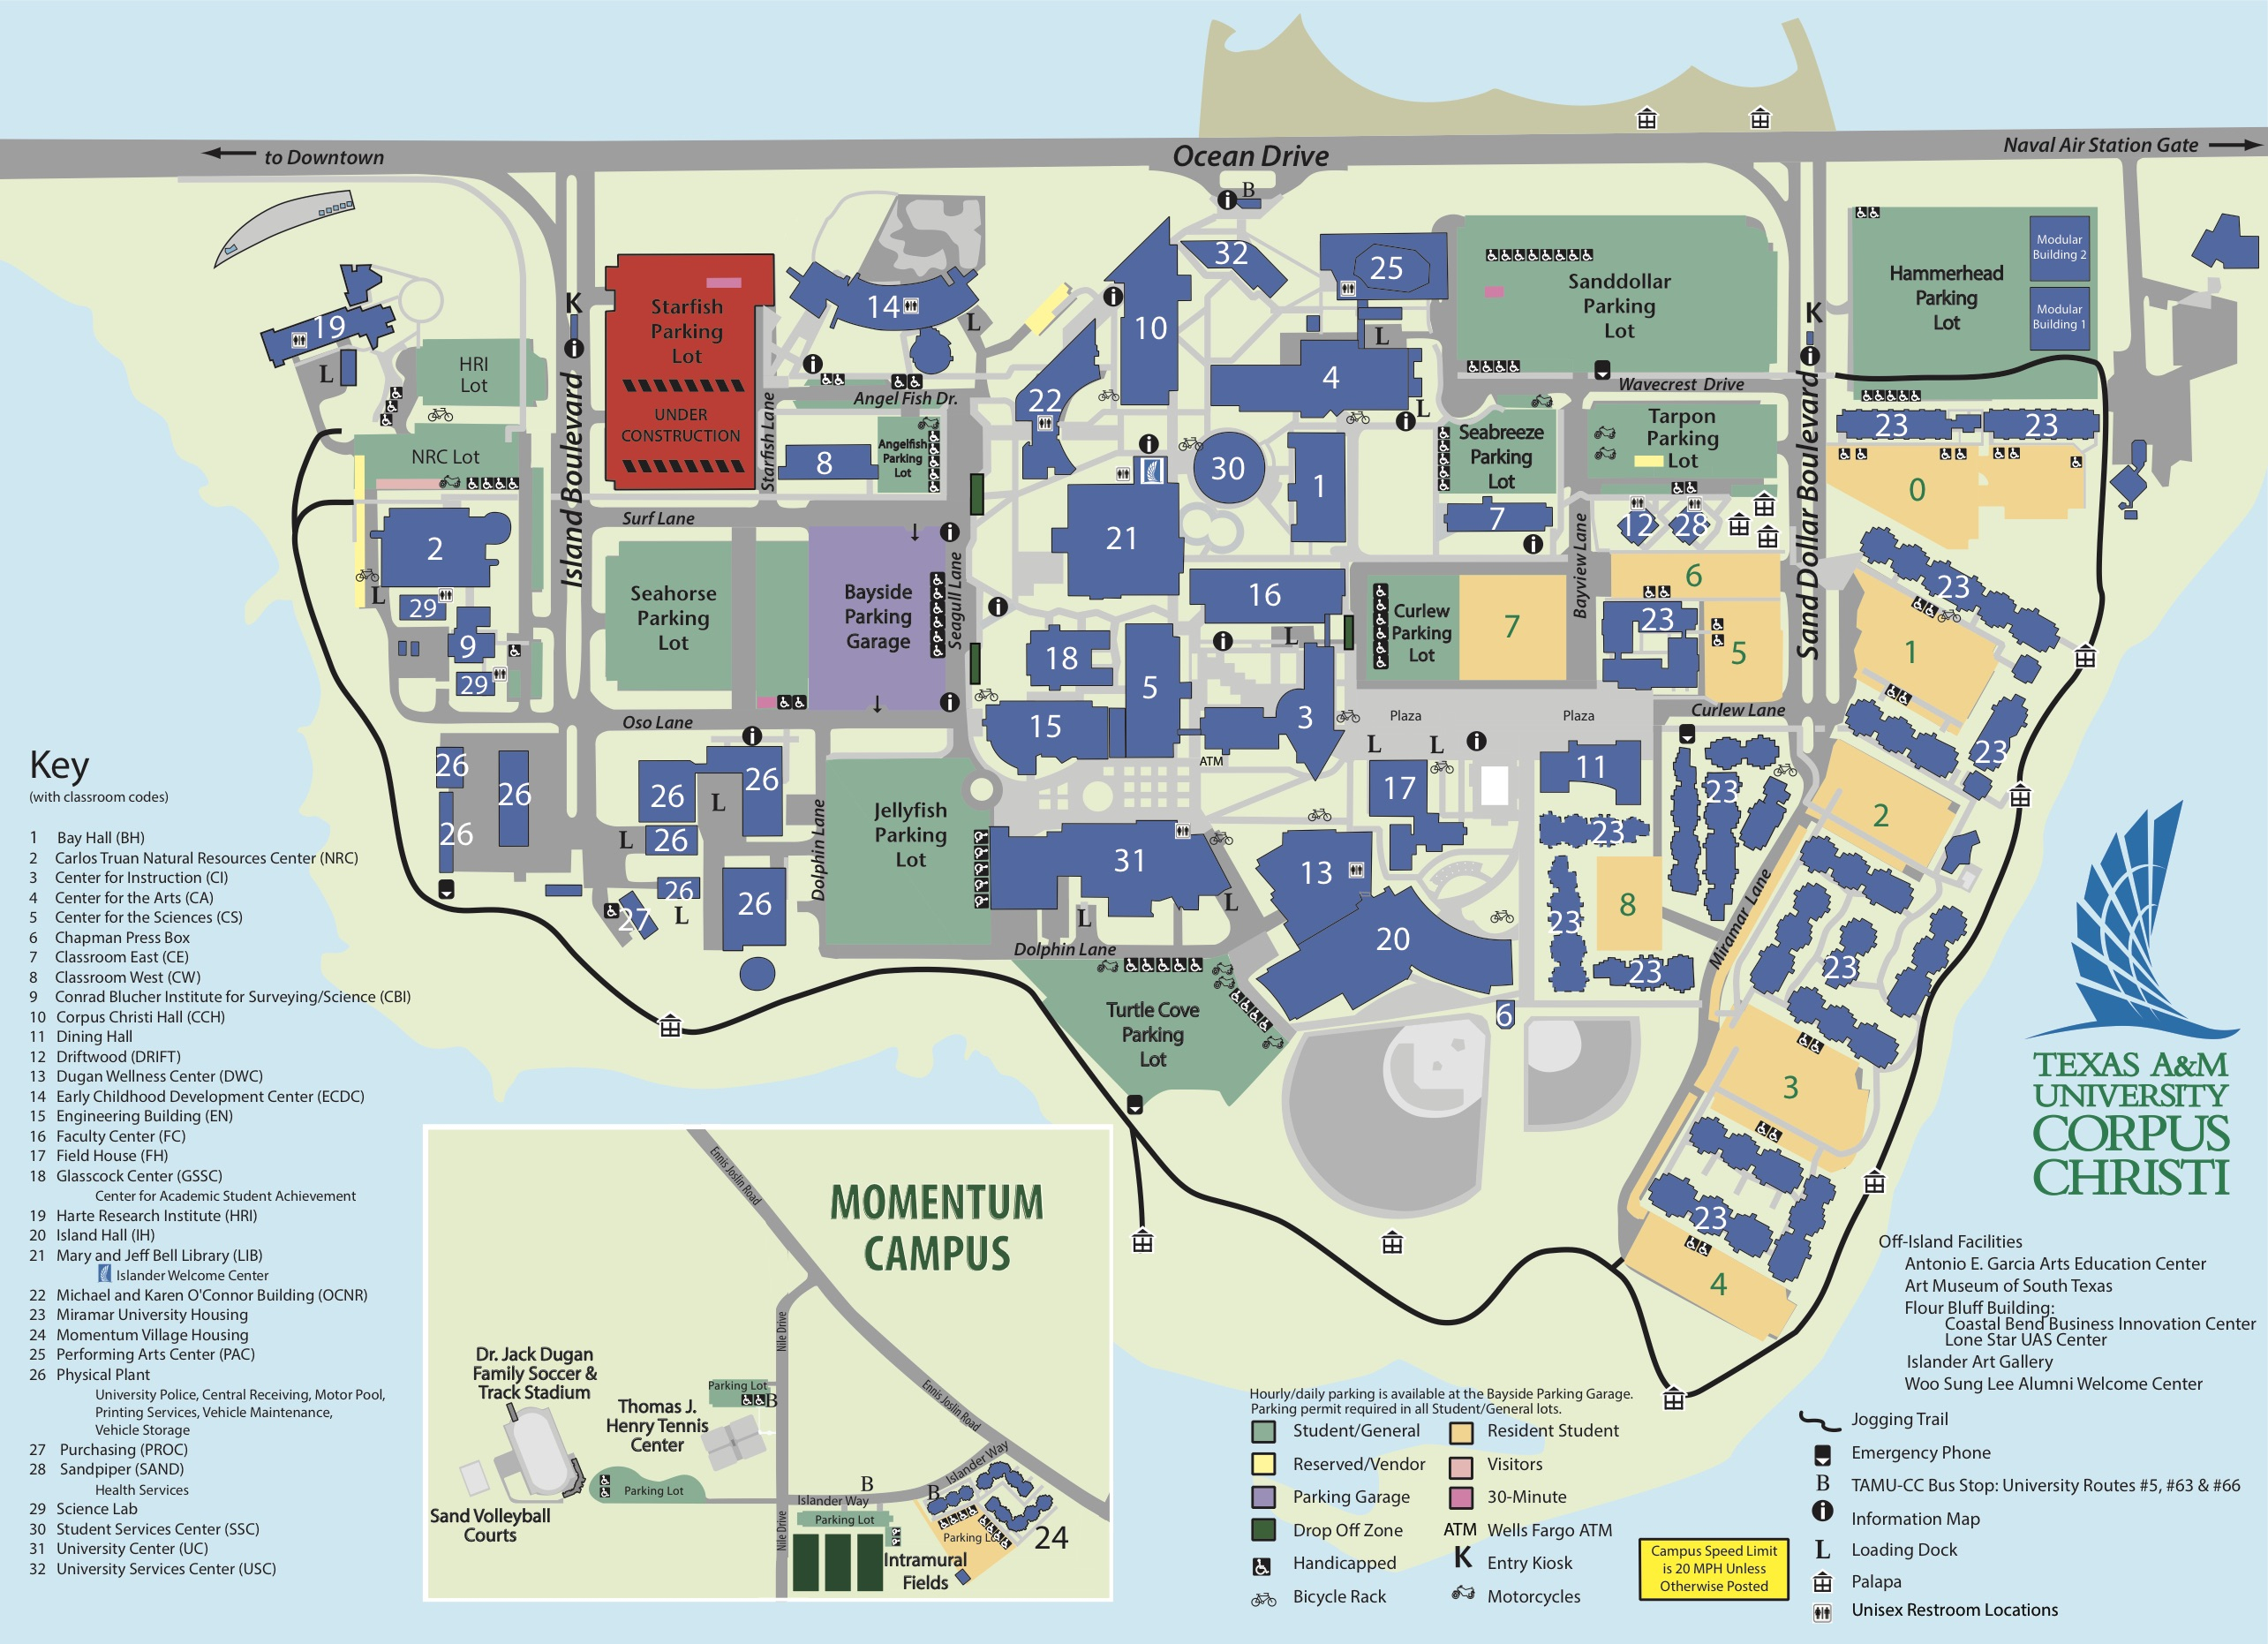 Campus Map Texas A&m University-Corpus Christi - Texas Tech Dorm Map